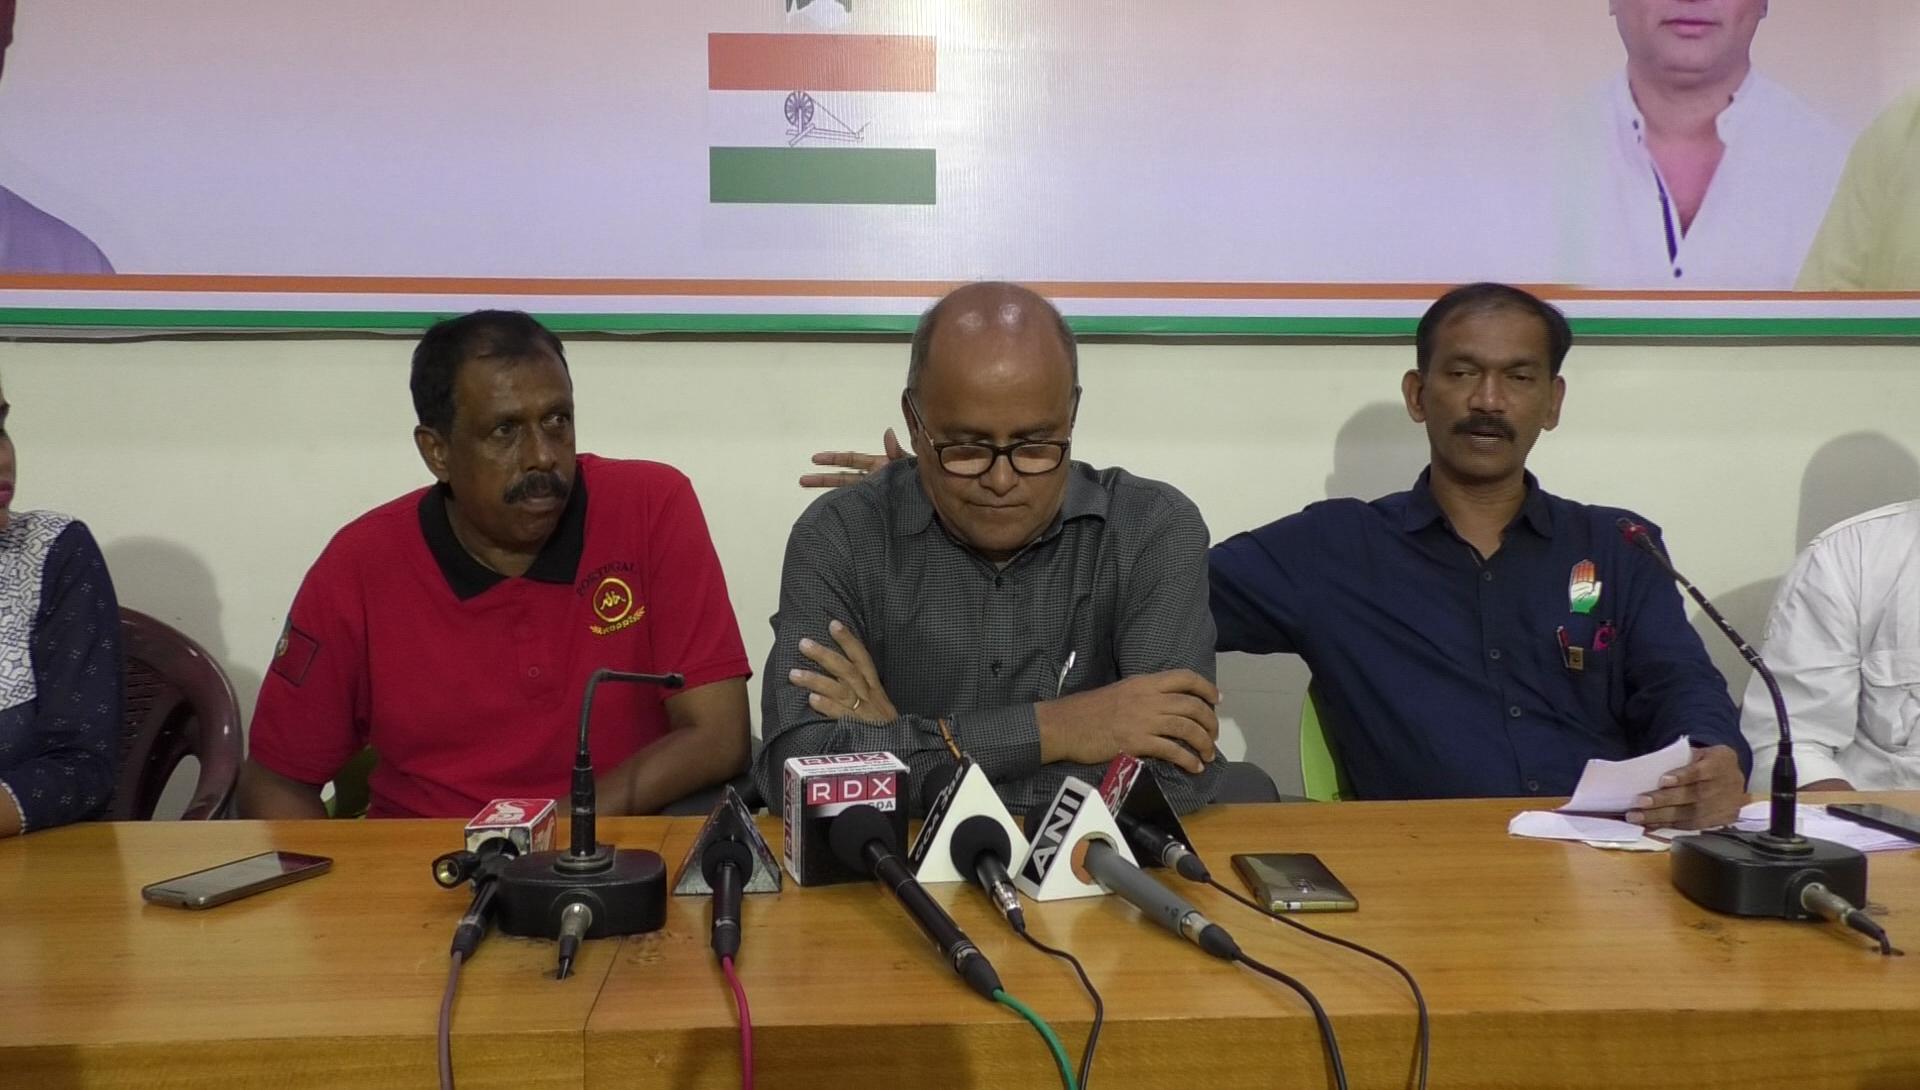 Girish mobilises support of anti-Parrikar people in Panaji